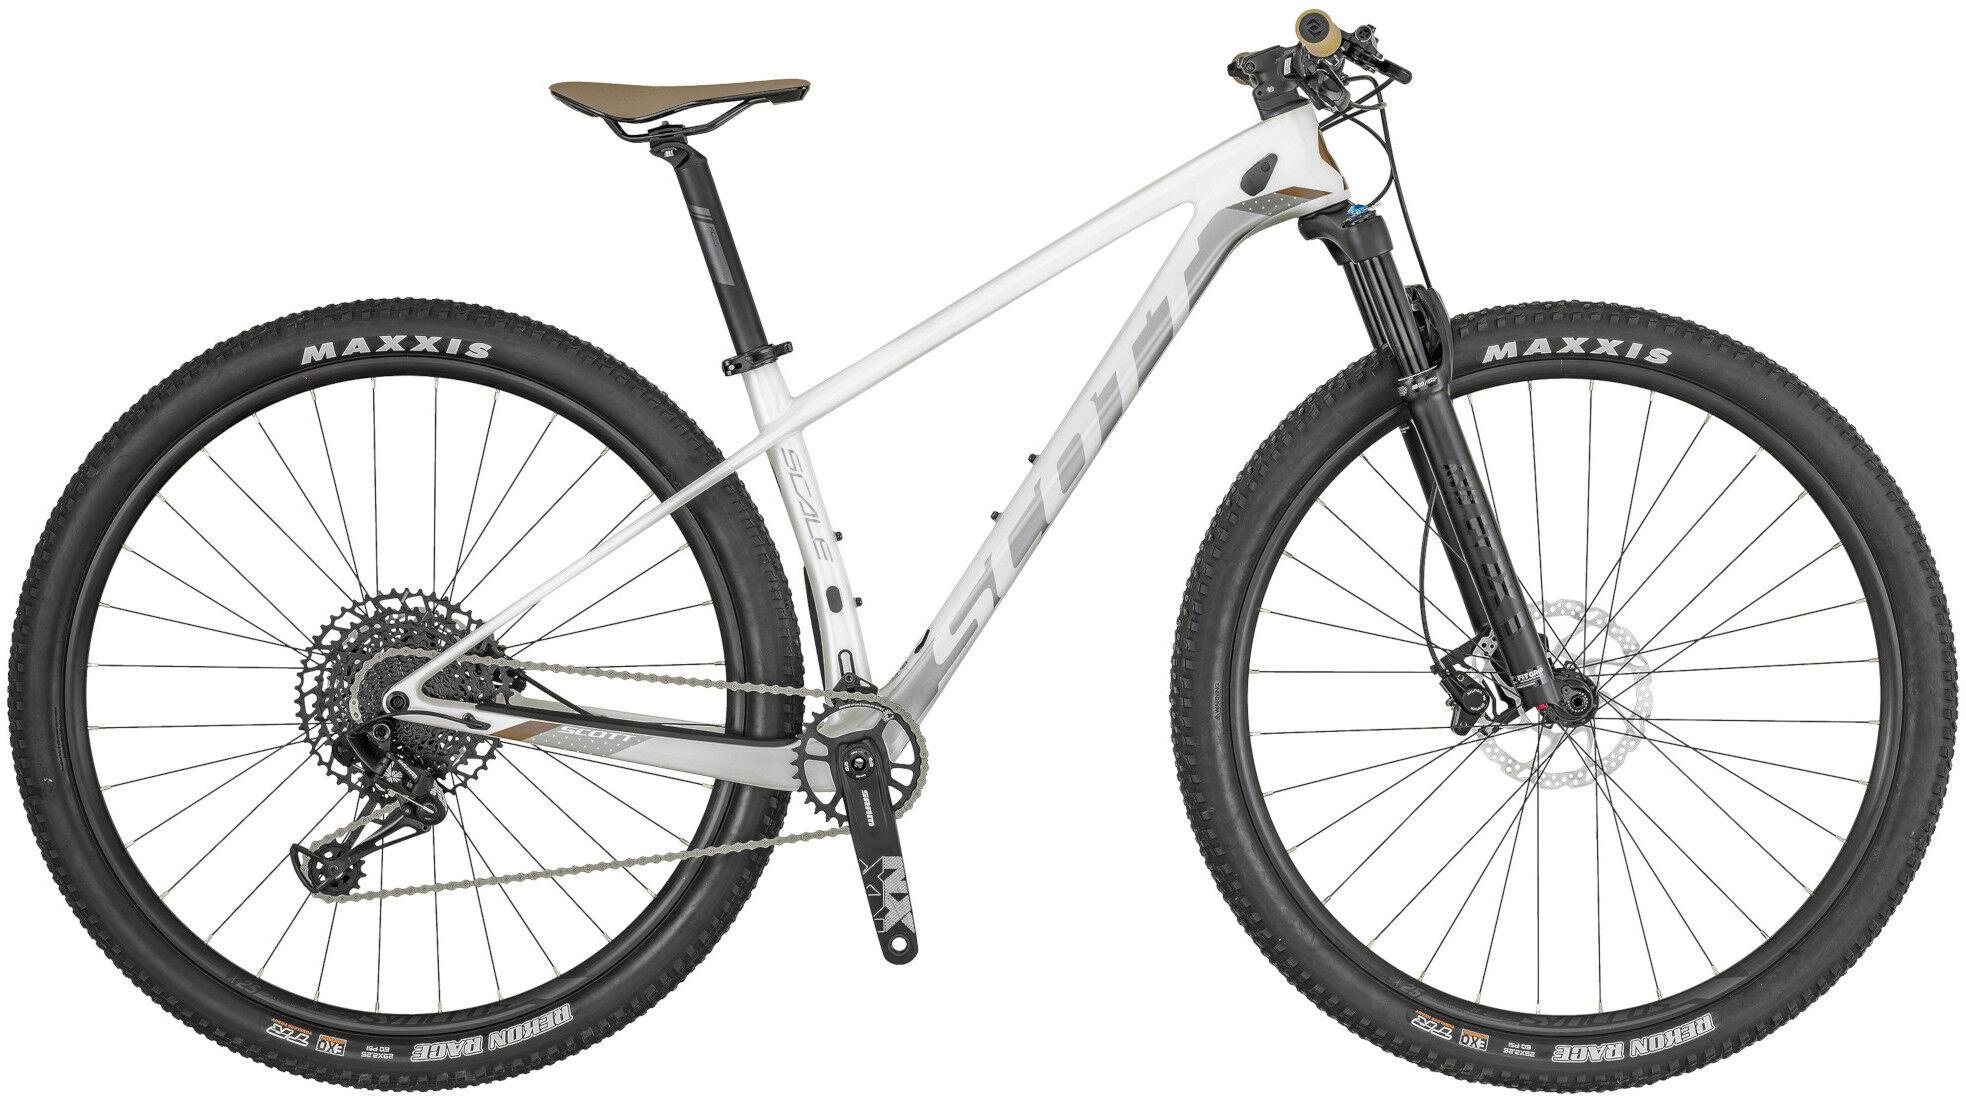 0e0b8473213 Scott Contessa Scale 900 - 2019 Maastopyörä - polkupyoratulkomailta.com